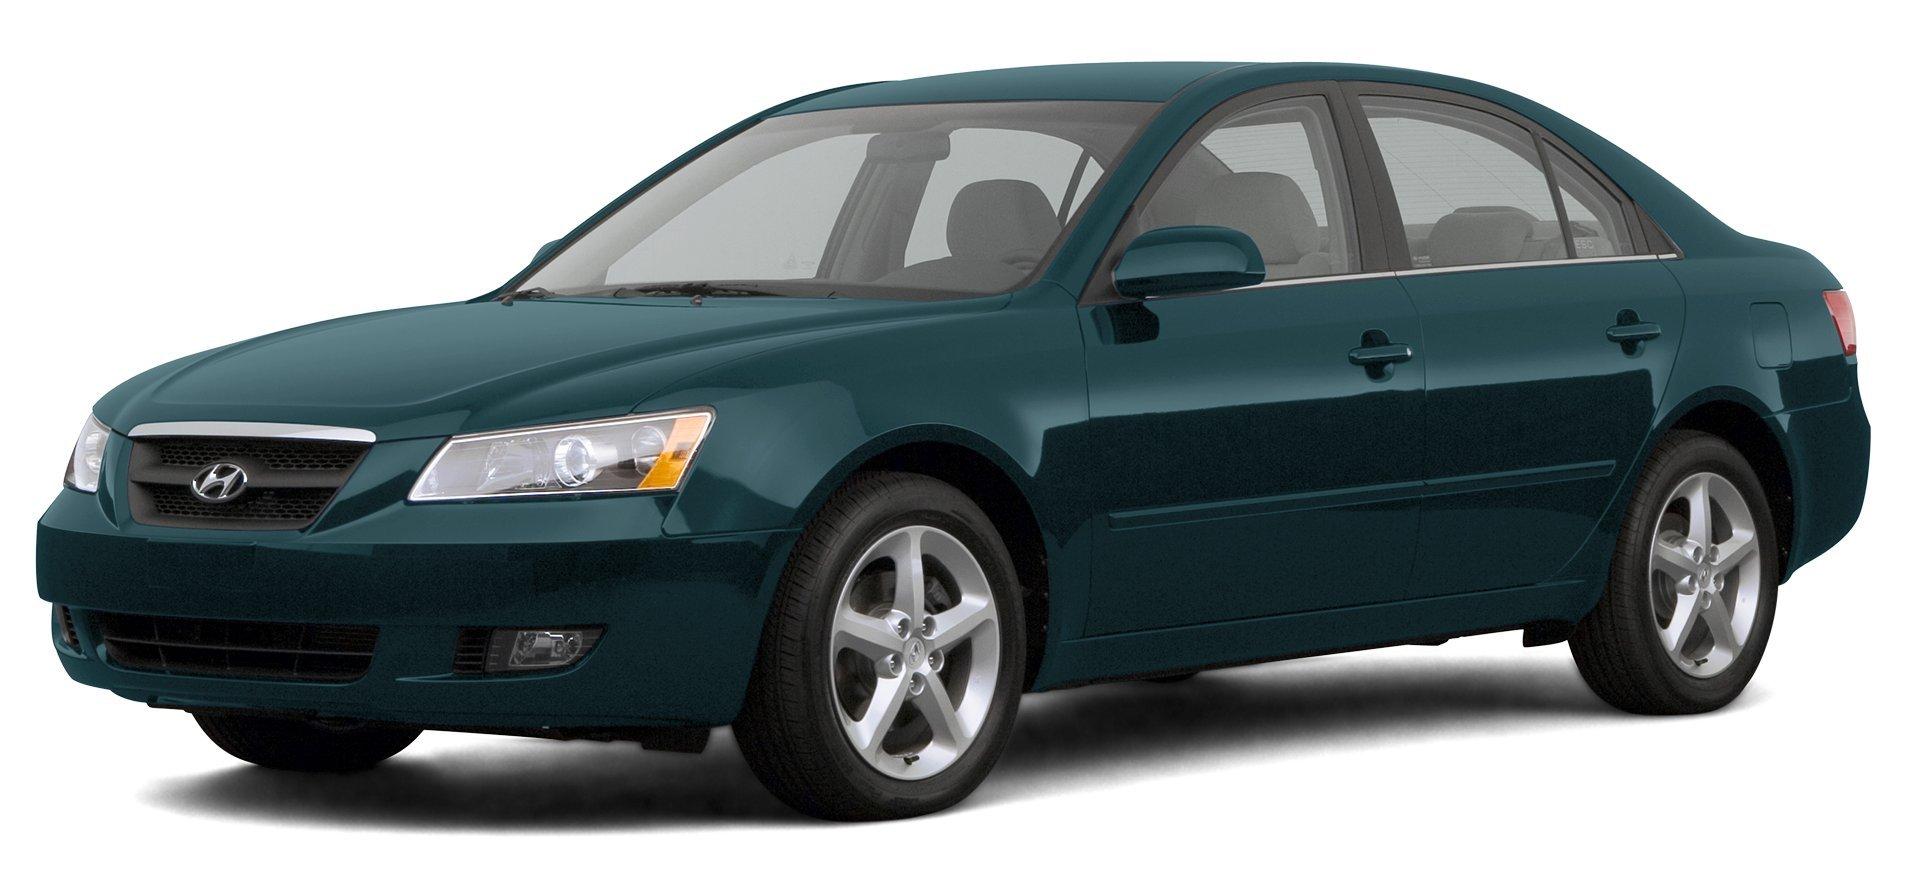 2007 hyundai sonata gls 4 door sedan automatic transmission